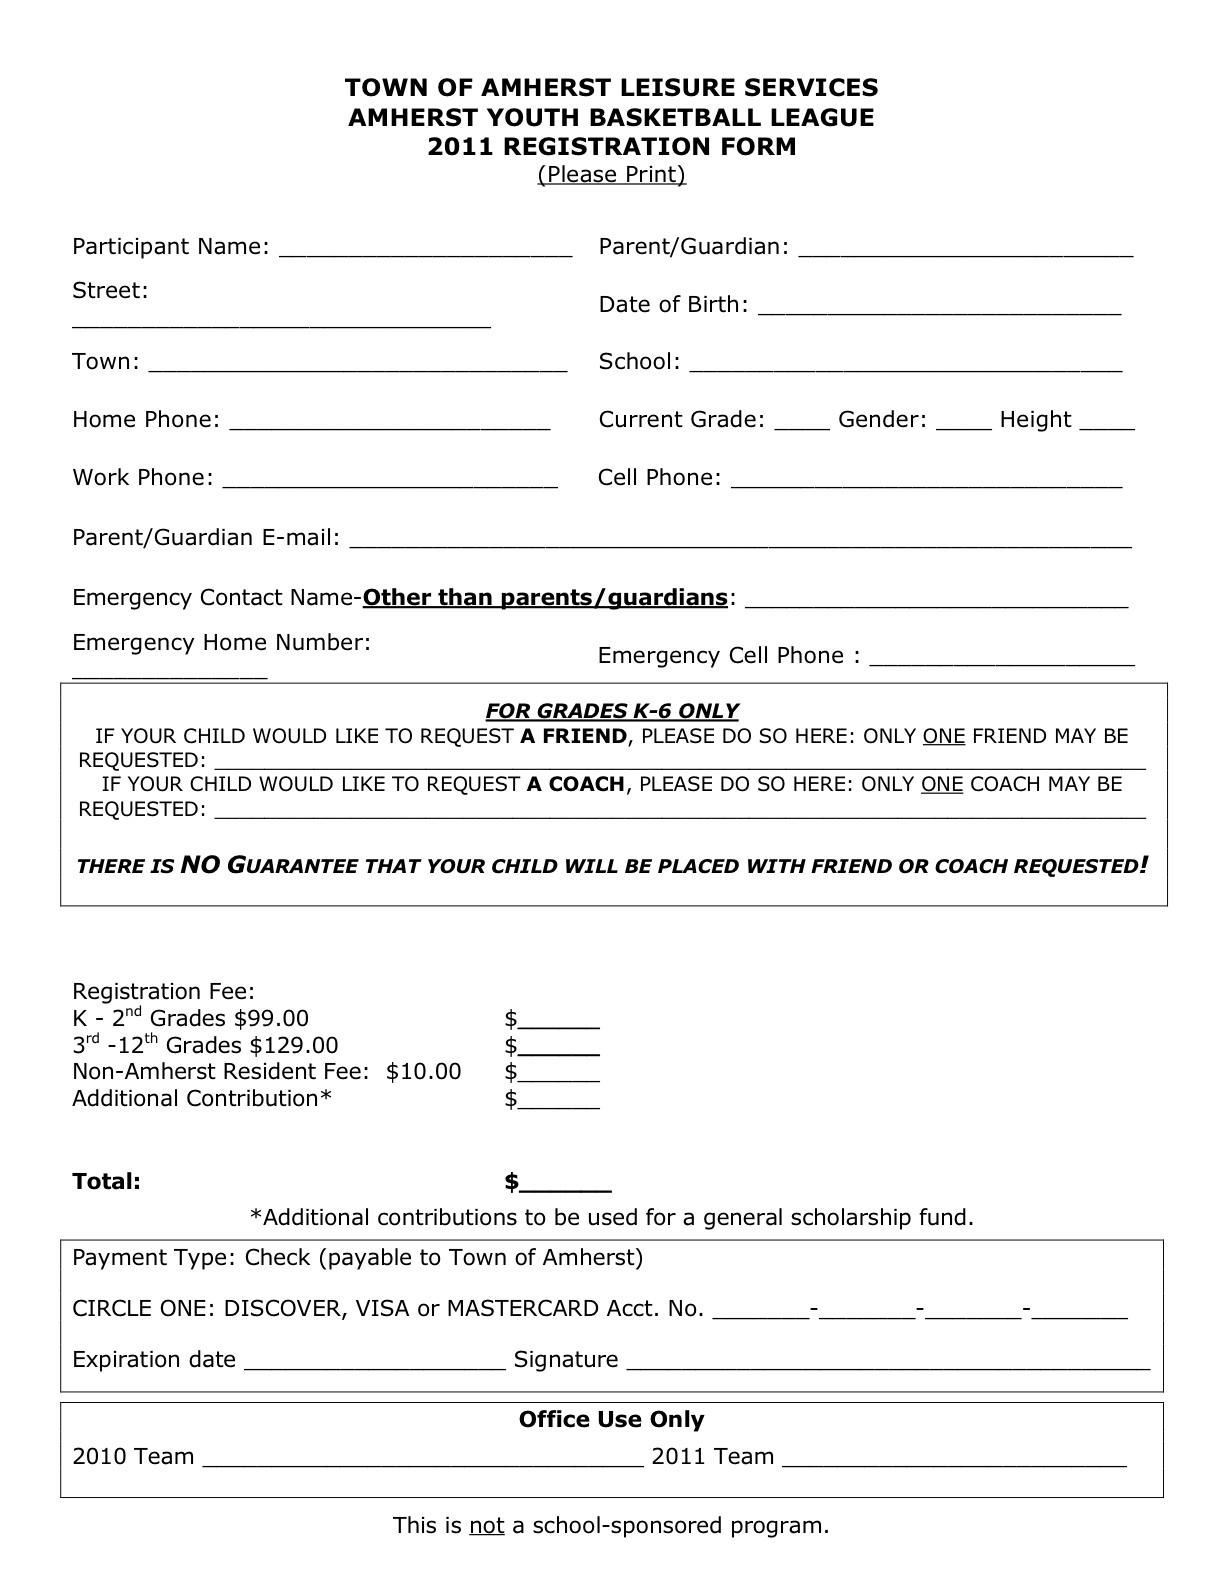 sport registration form template - application form registration form template html free